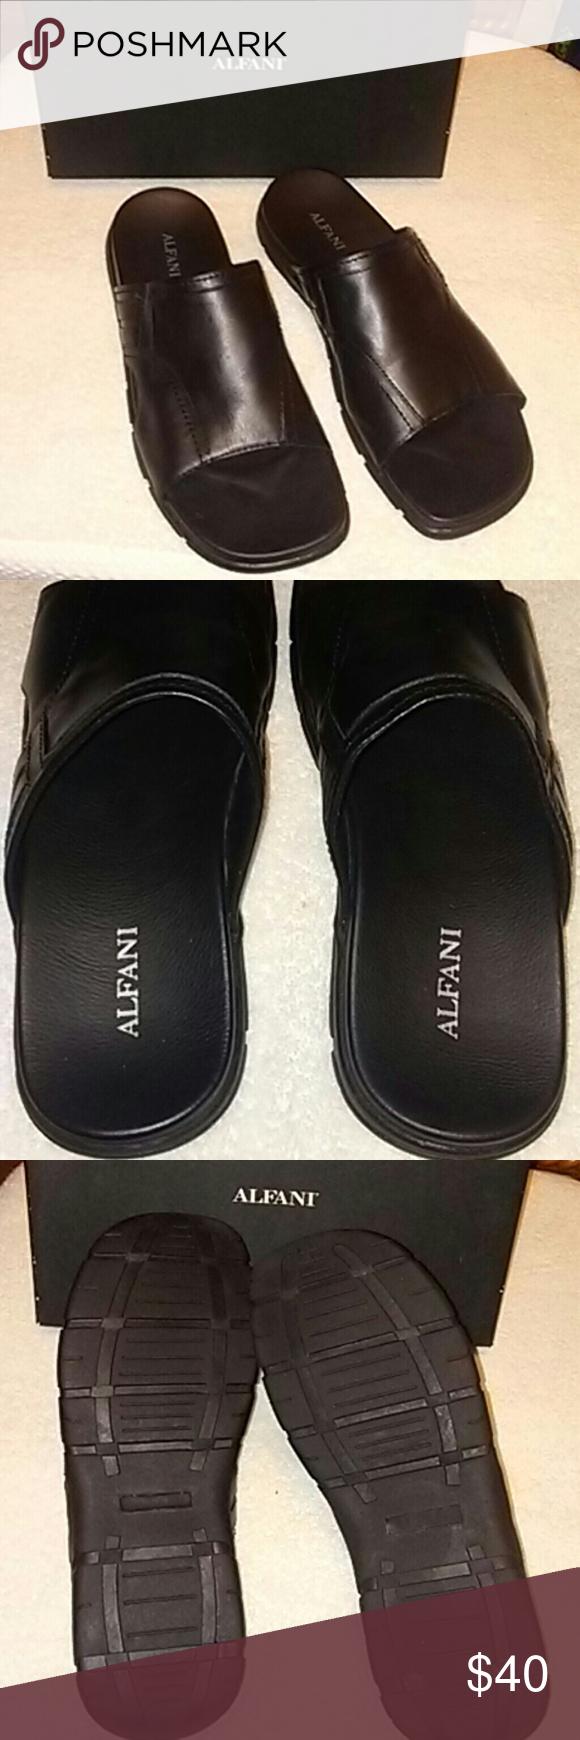 NWB ALFANI Sandals 13M NWB 13M ALFANI SANDALS BLACK Alfani Shoes Sandals & Flip-Flops